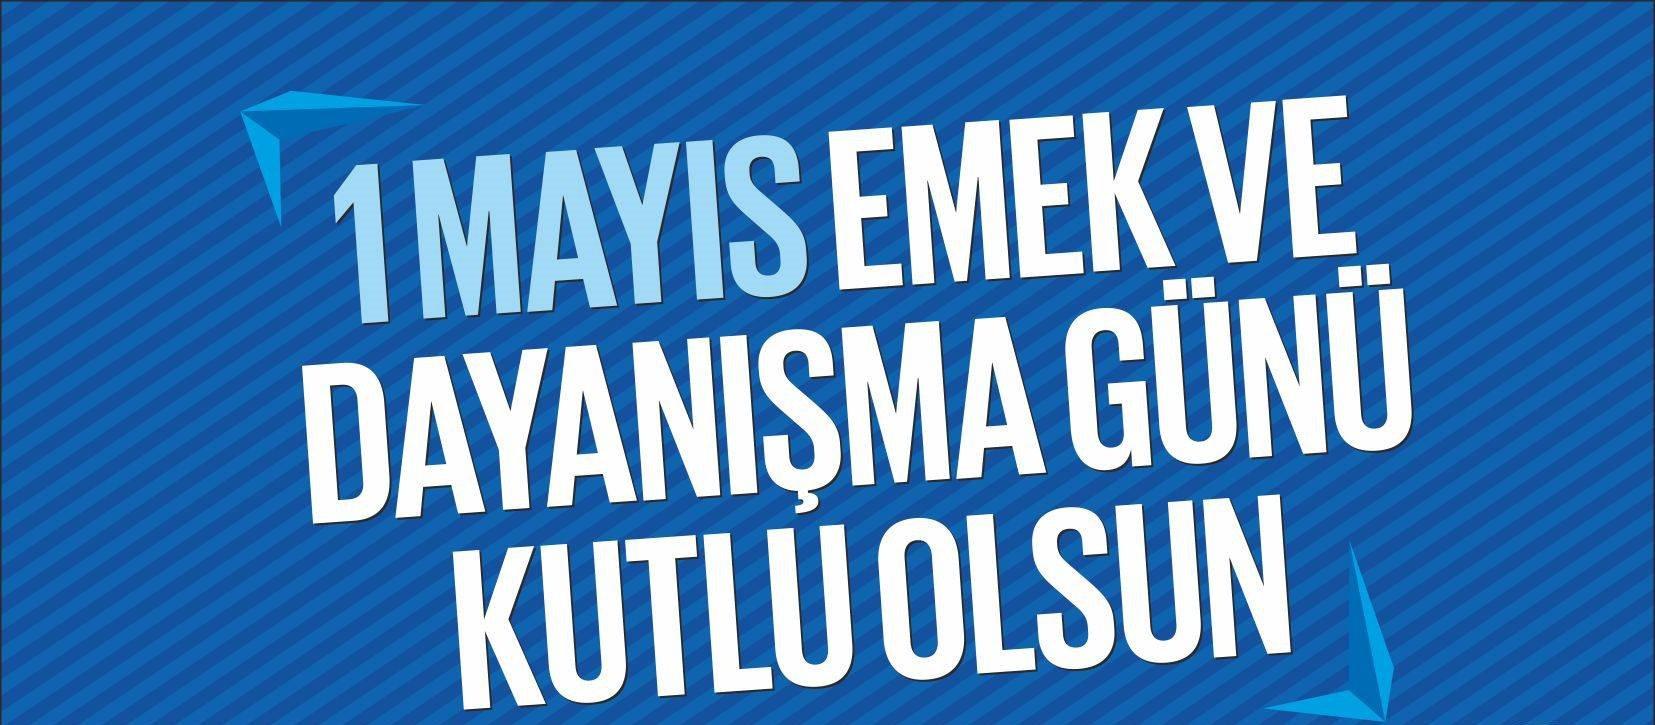 of-belediyesi-1mayis.jpg